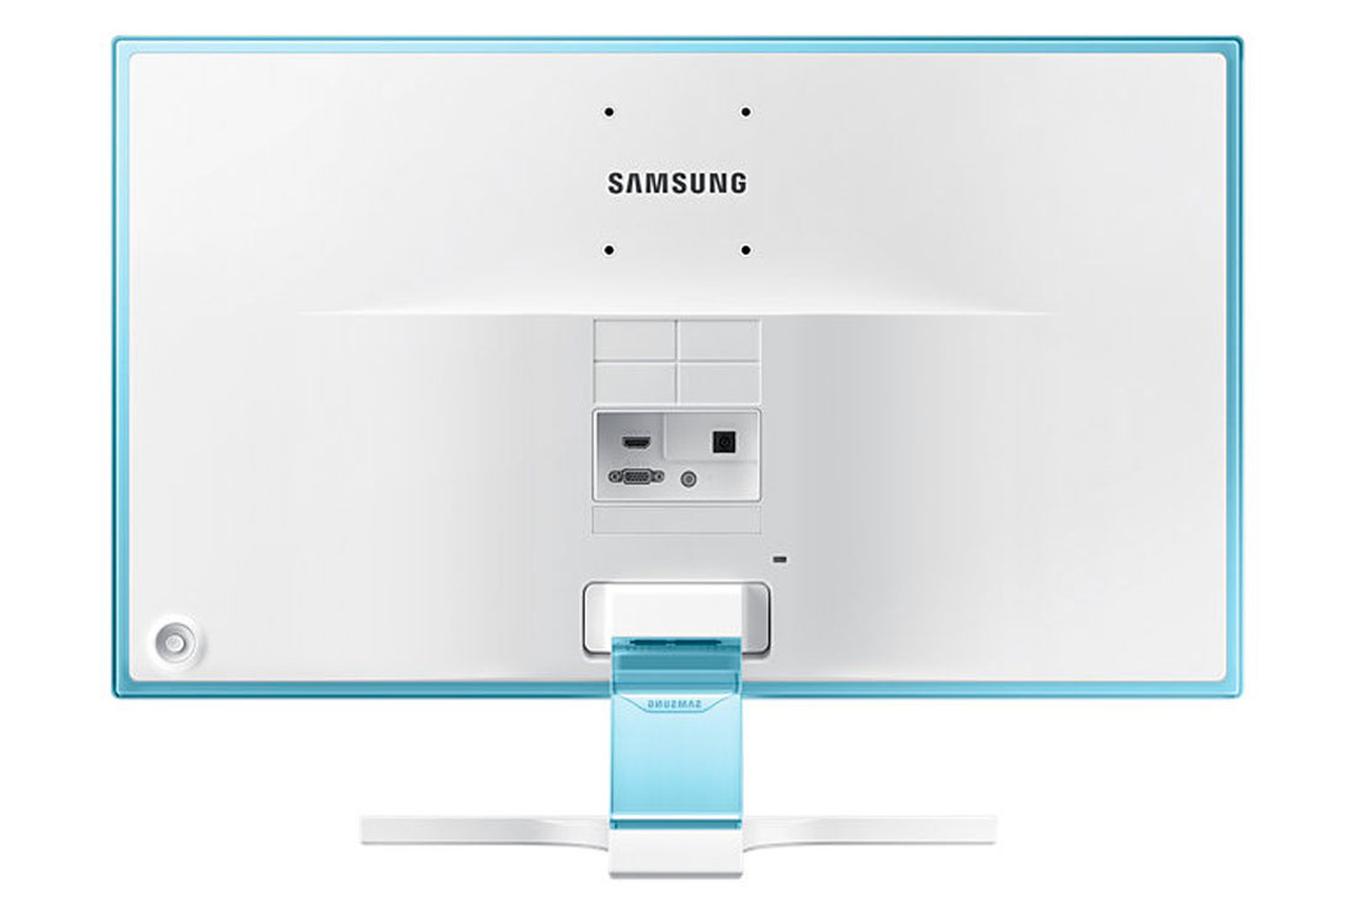 ecran informatique samsung s24e391hl en 4111311 darty. Black Bedroom Furniture Sets. Home Design Ideas